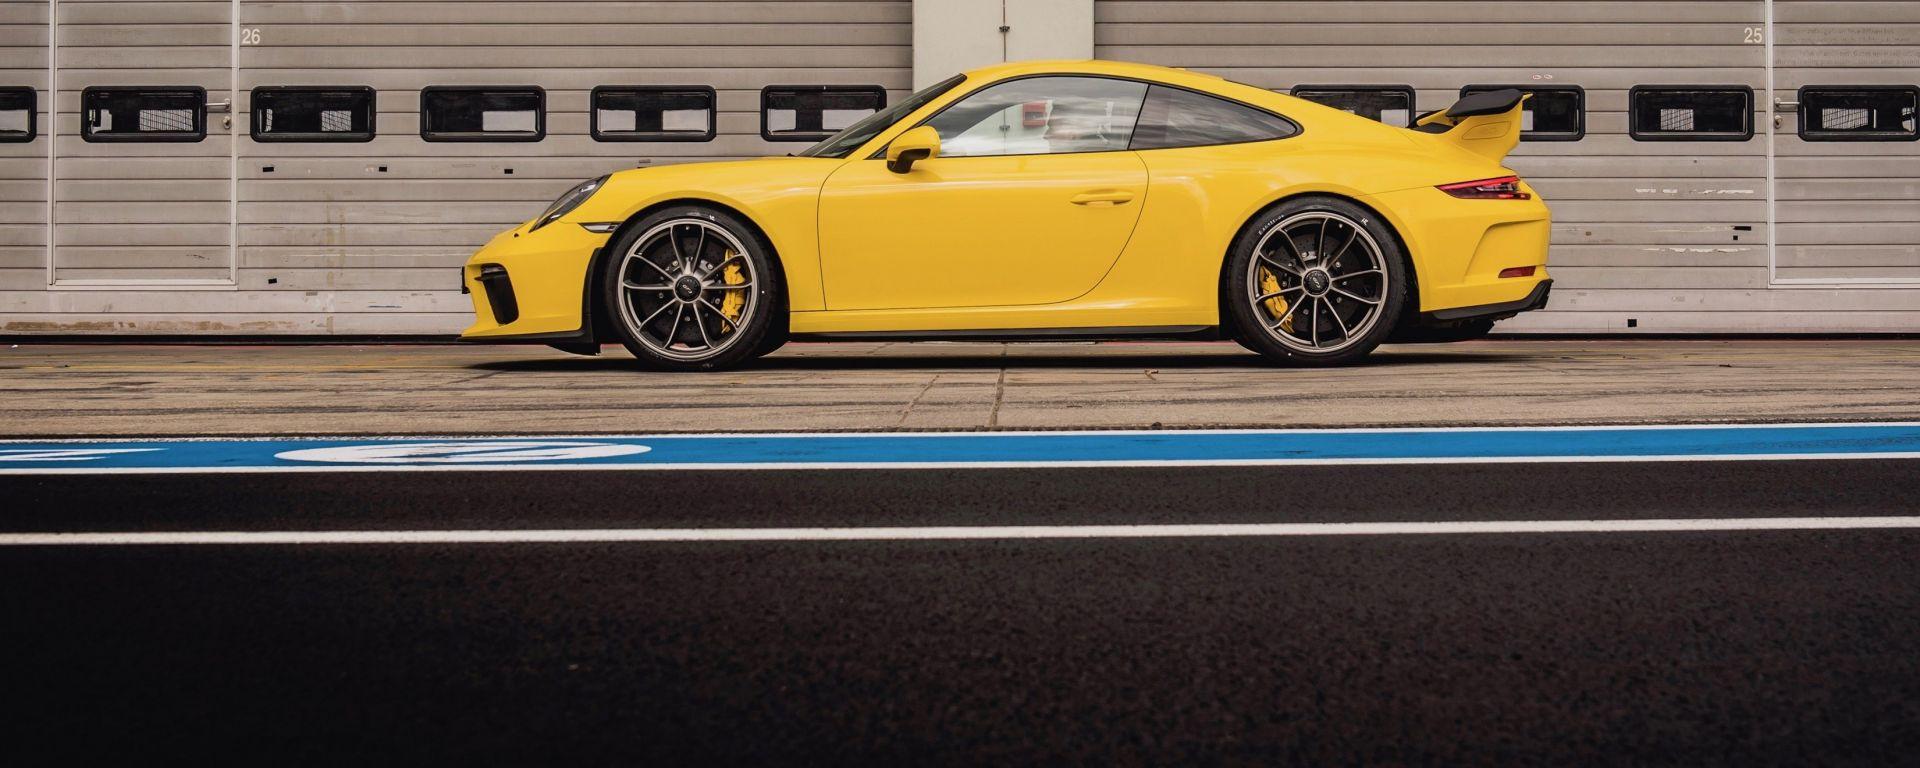 La Porsche 911 GT3 migliora il proprio record al Nurburgring